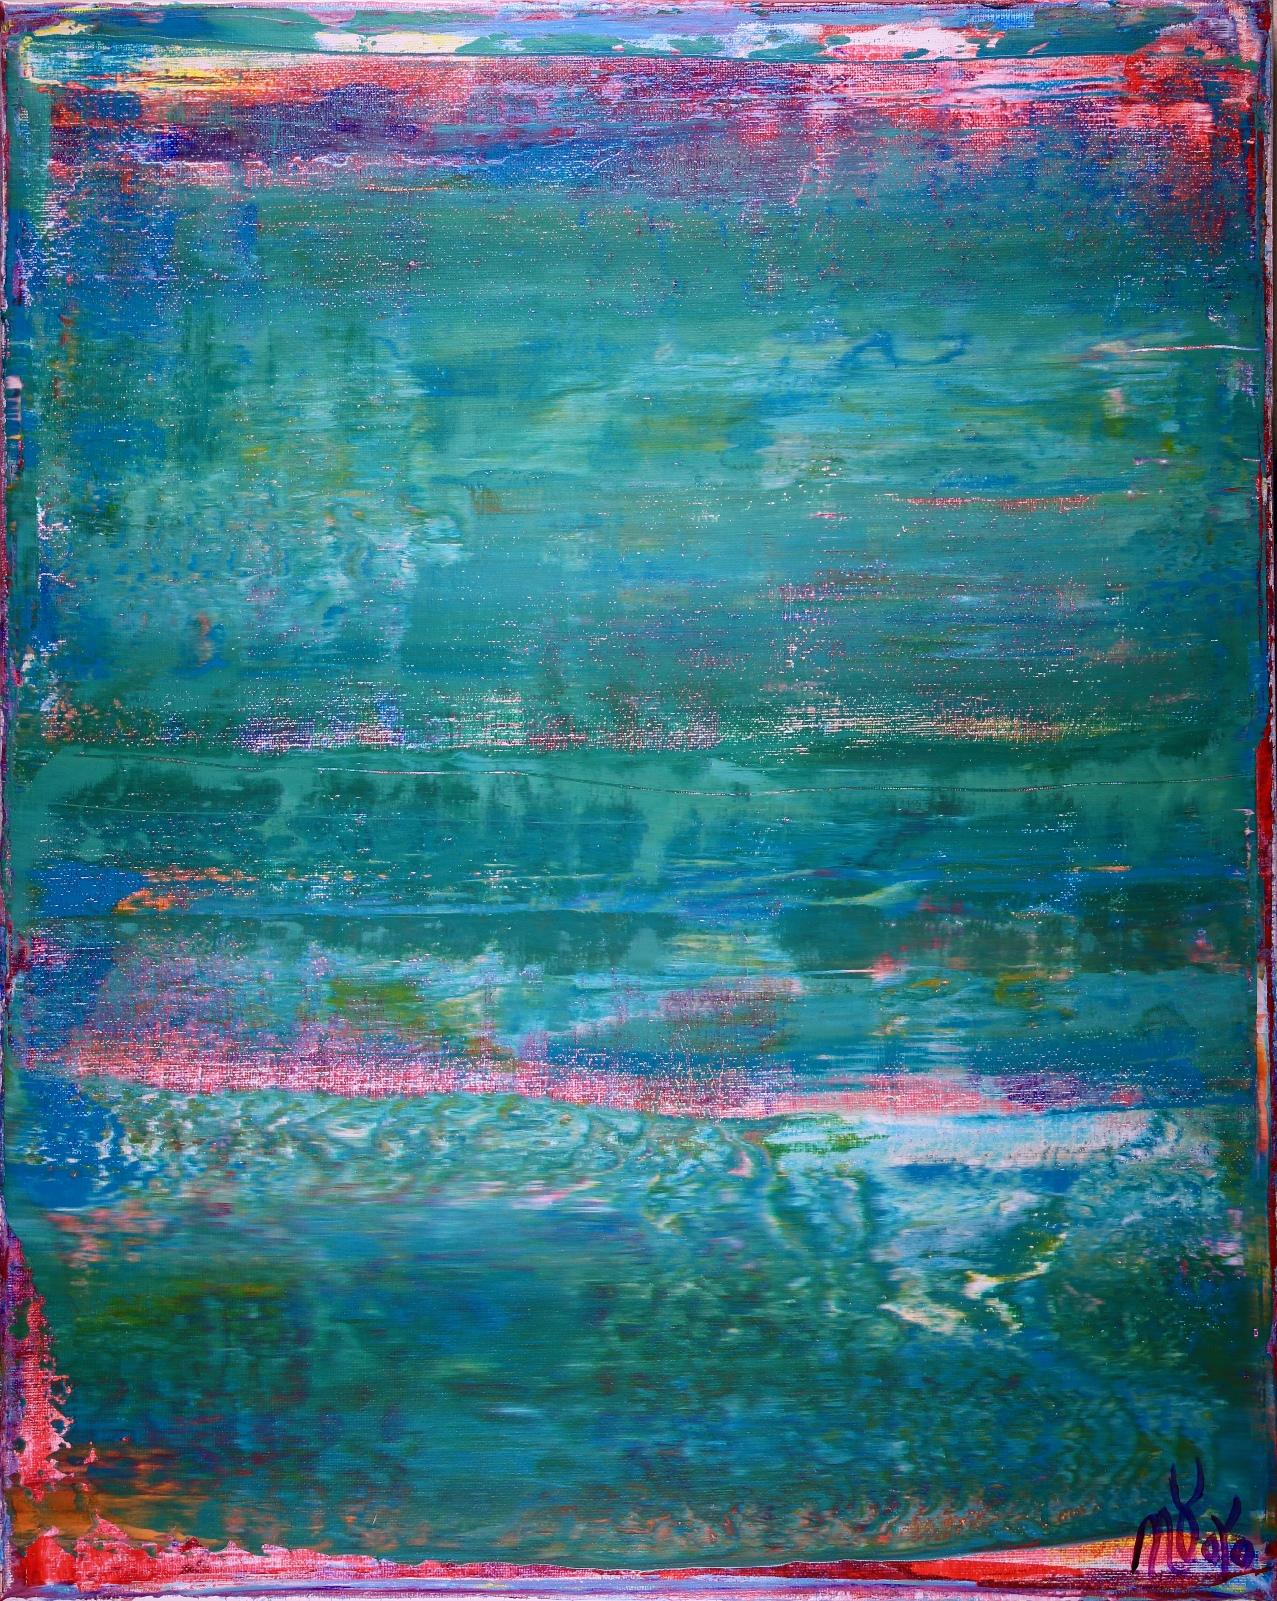 SOLD - Shades of Aqua Green (2019) by Nestor Toro